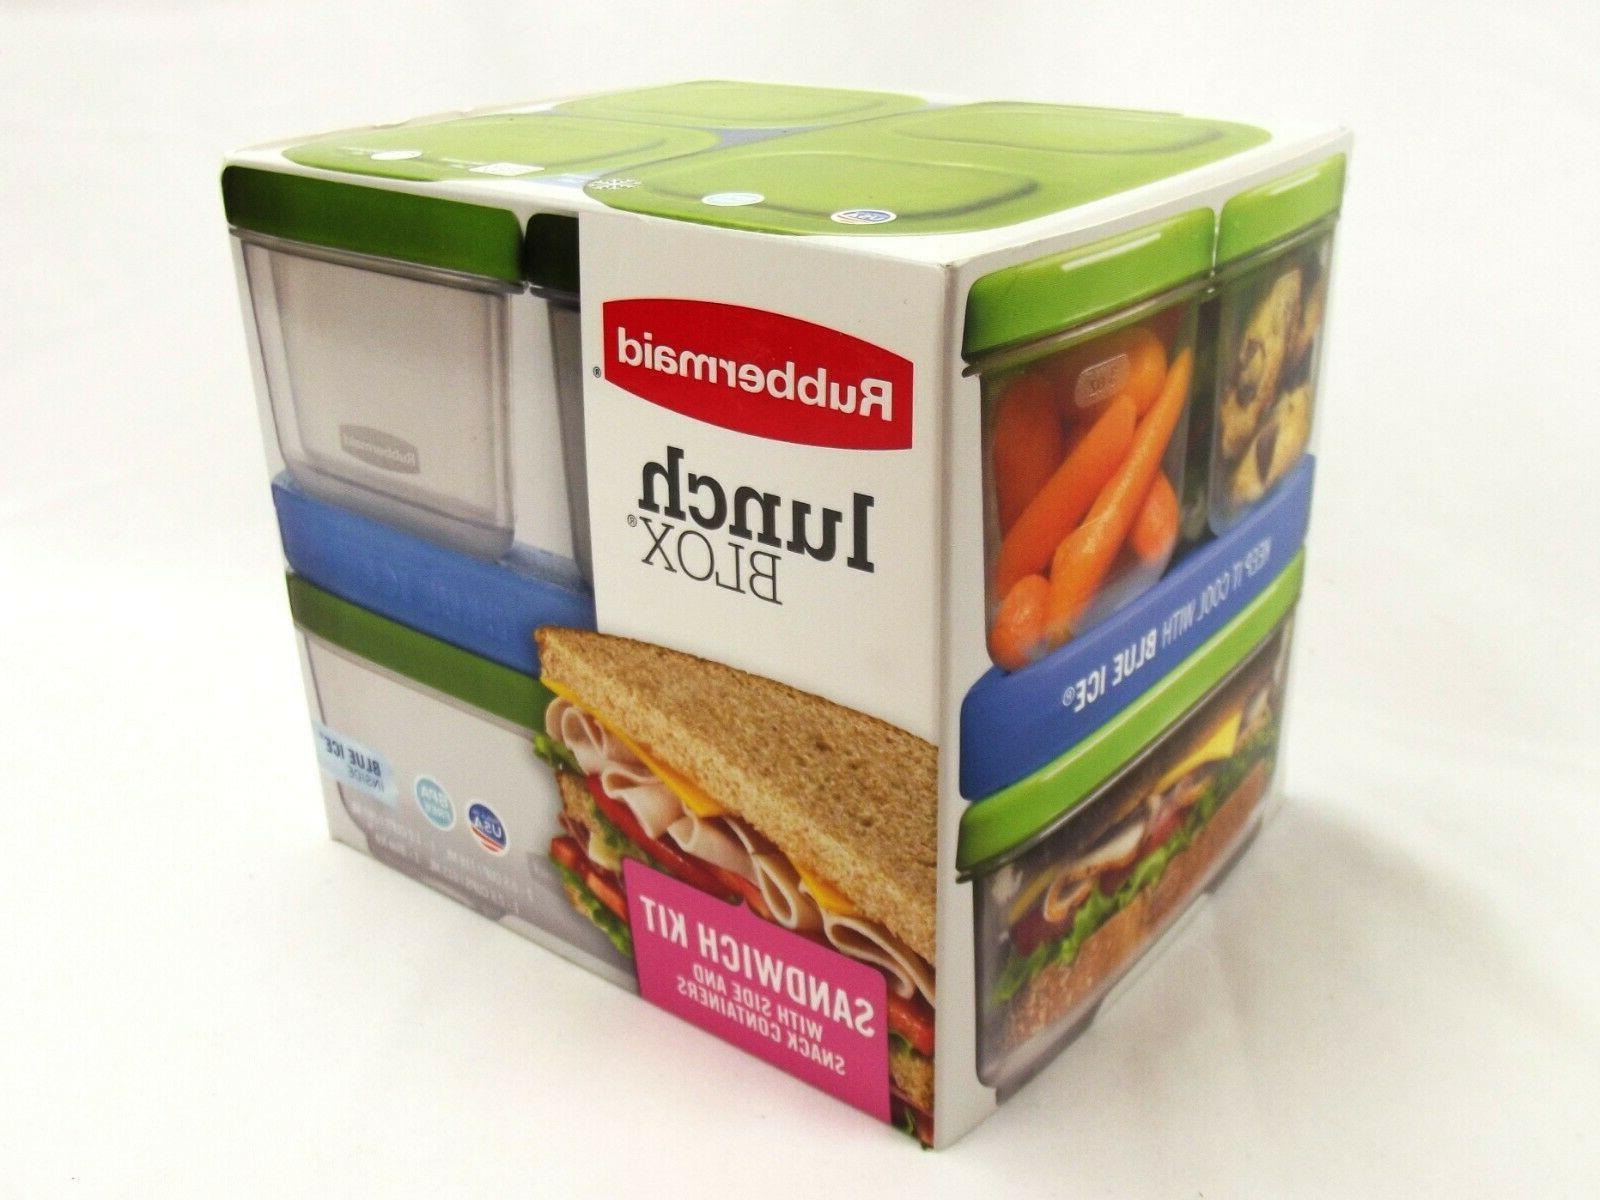 lunch blox kit